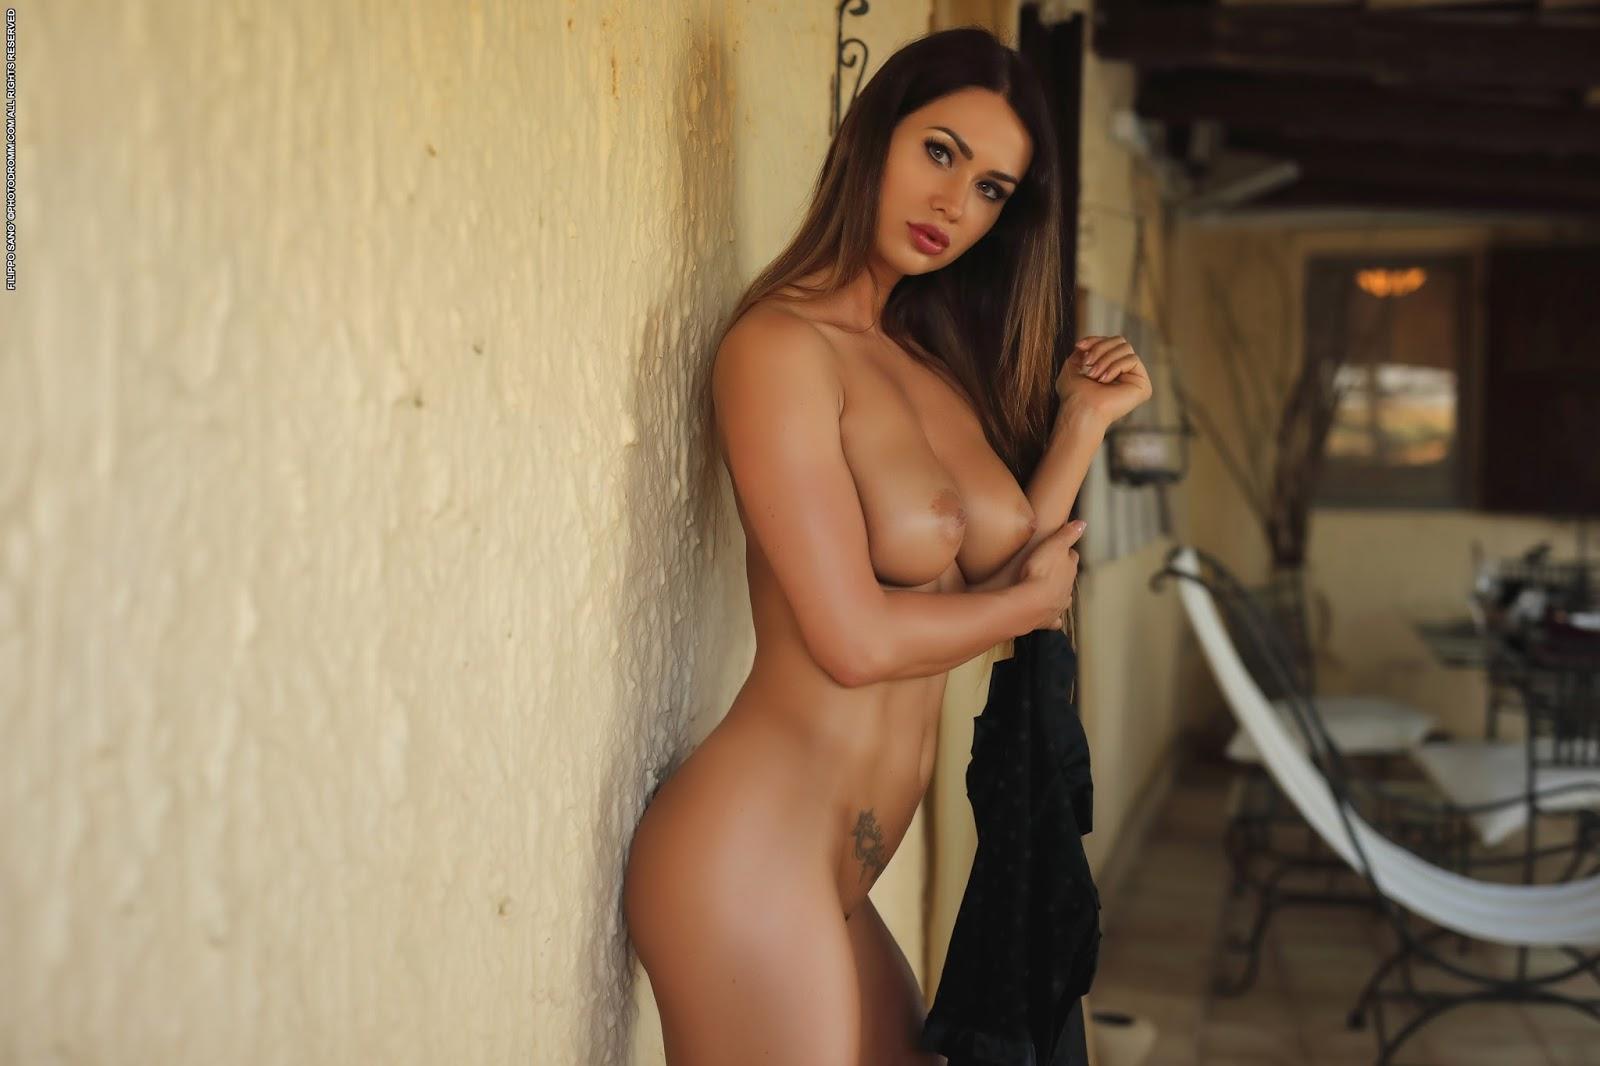 Justyna C Porn Pics